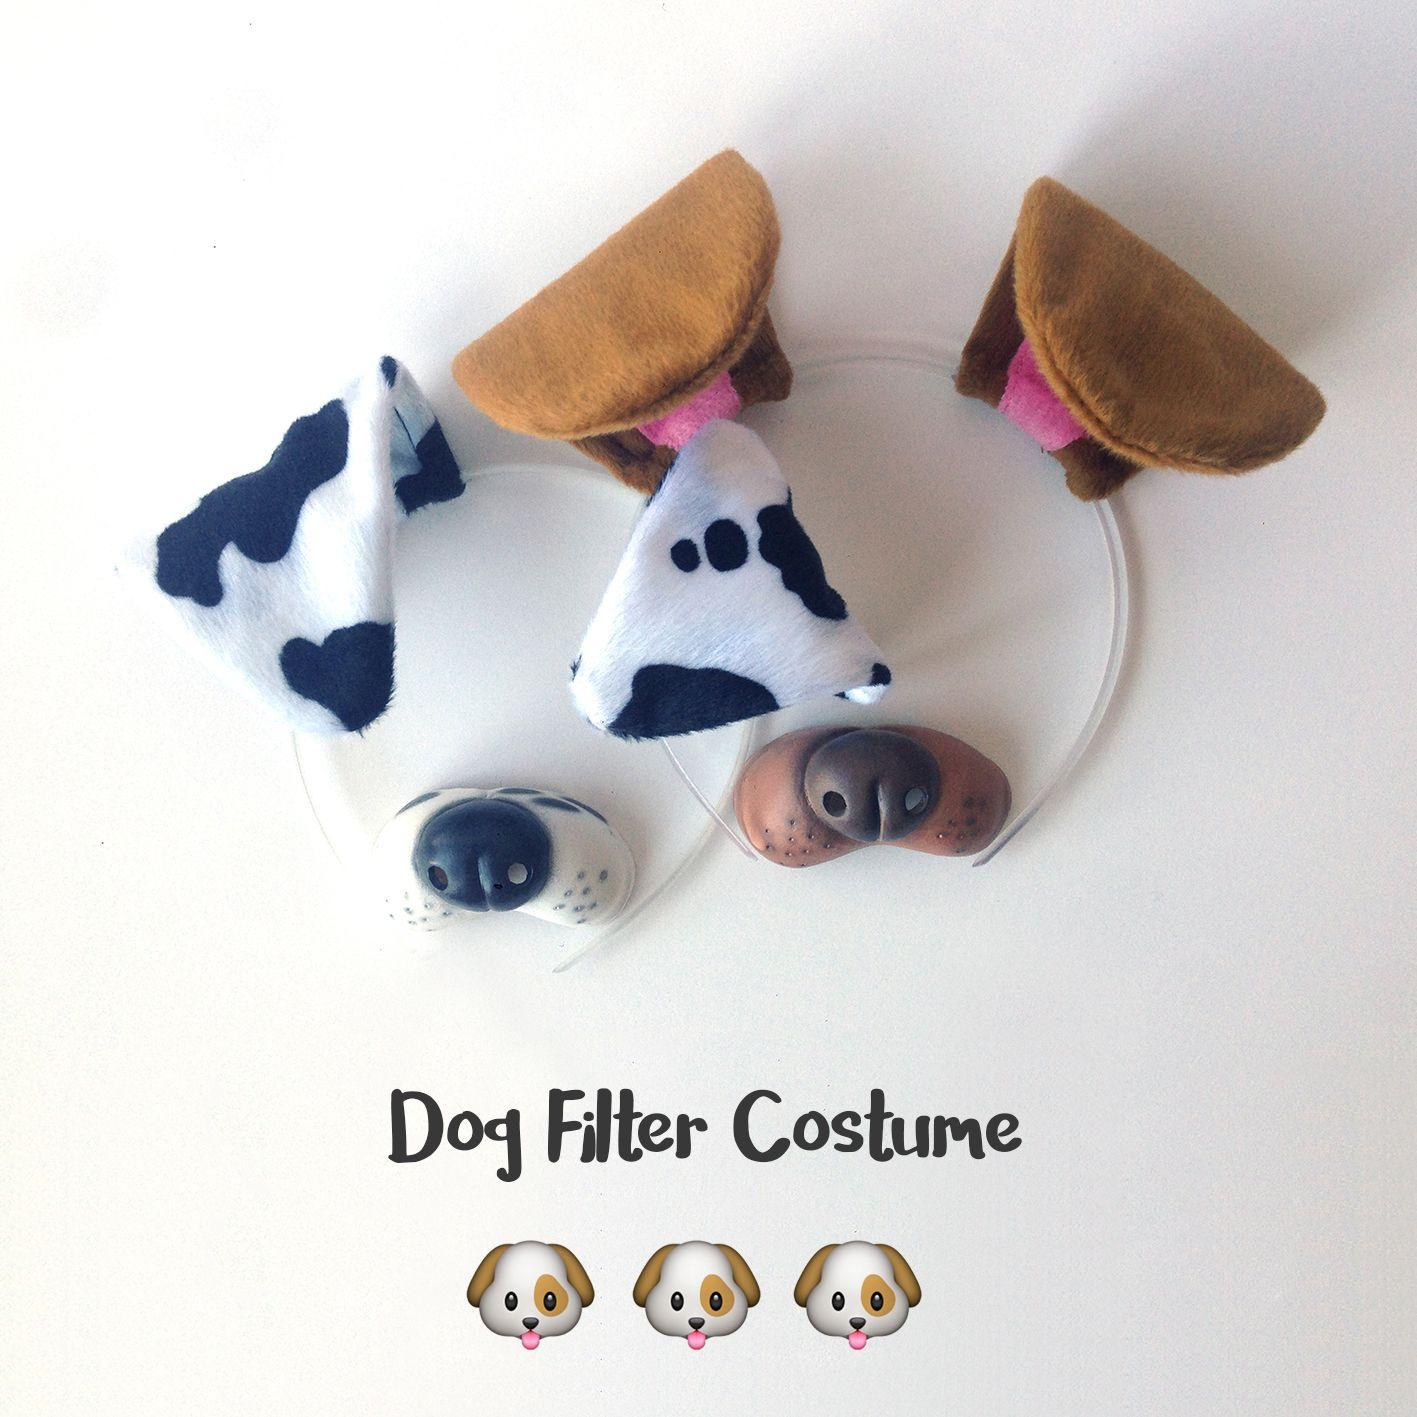 Dog Filter Costume on Amazon!